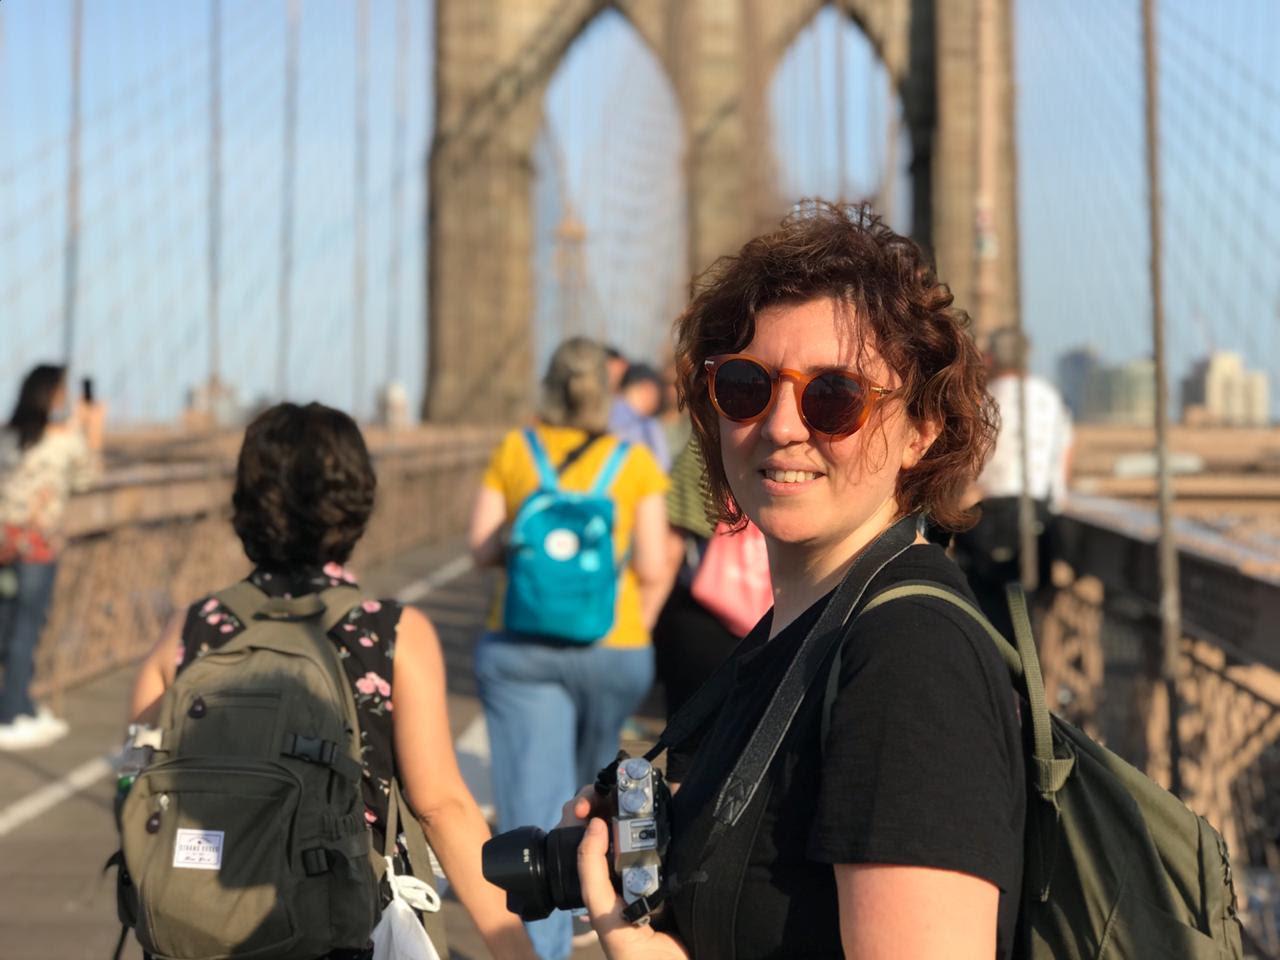 Daniela Mandriotti, Sobreviviente de leucemia mieloide aguda